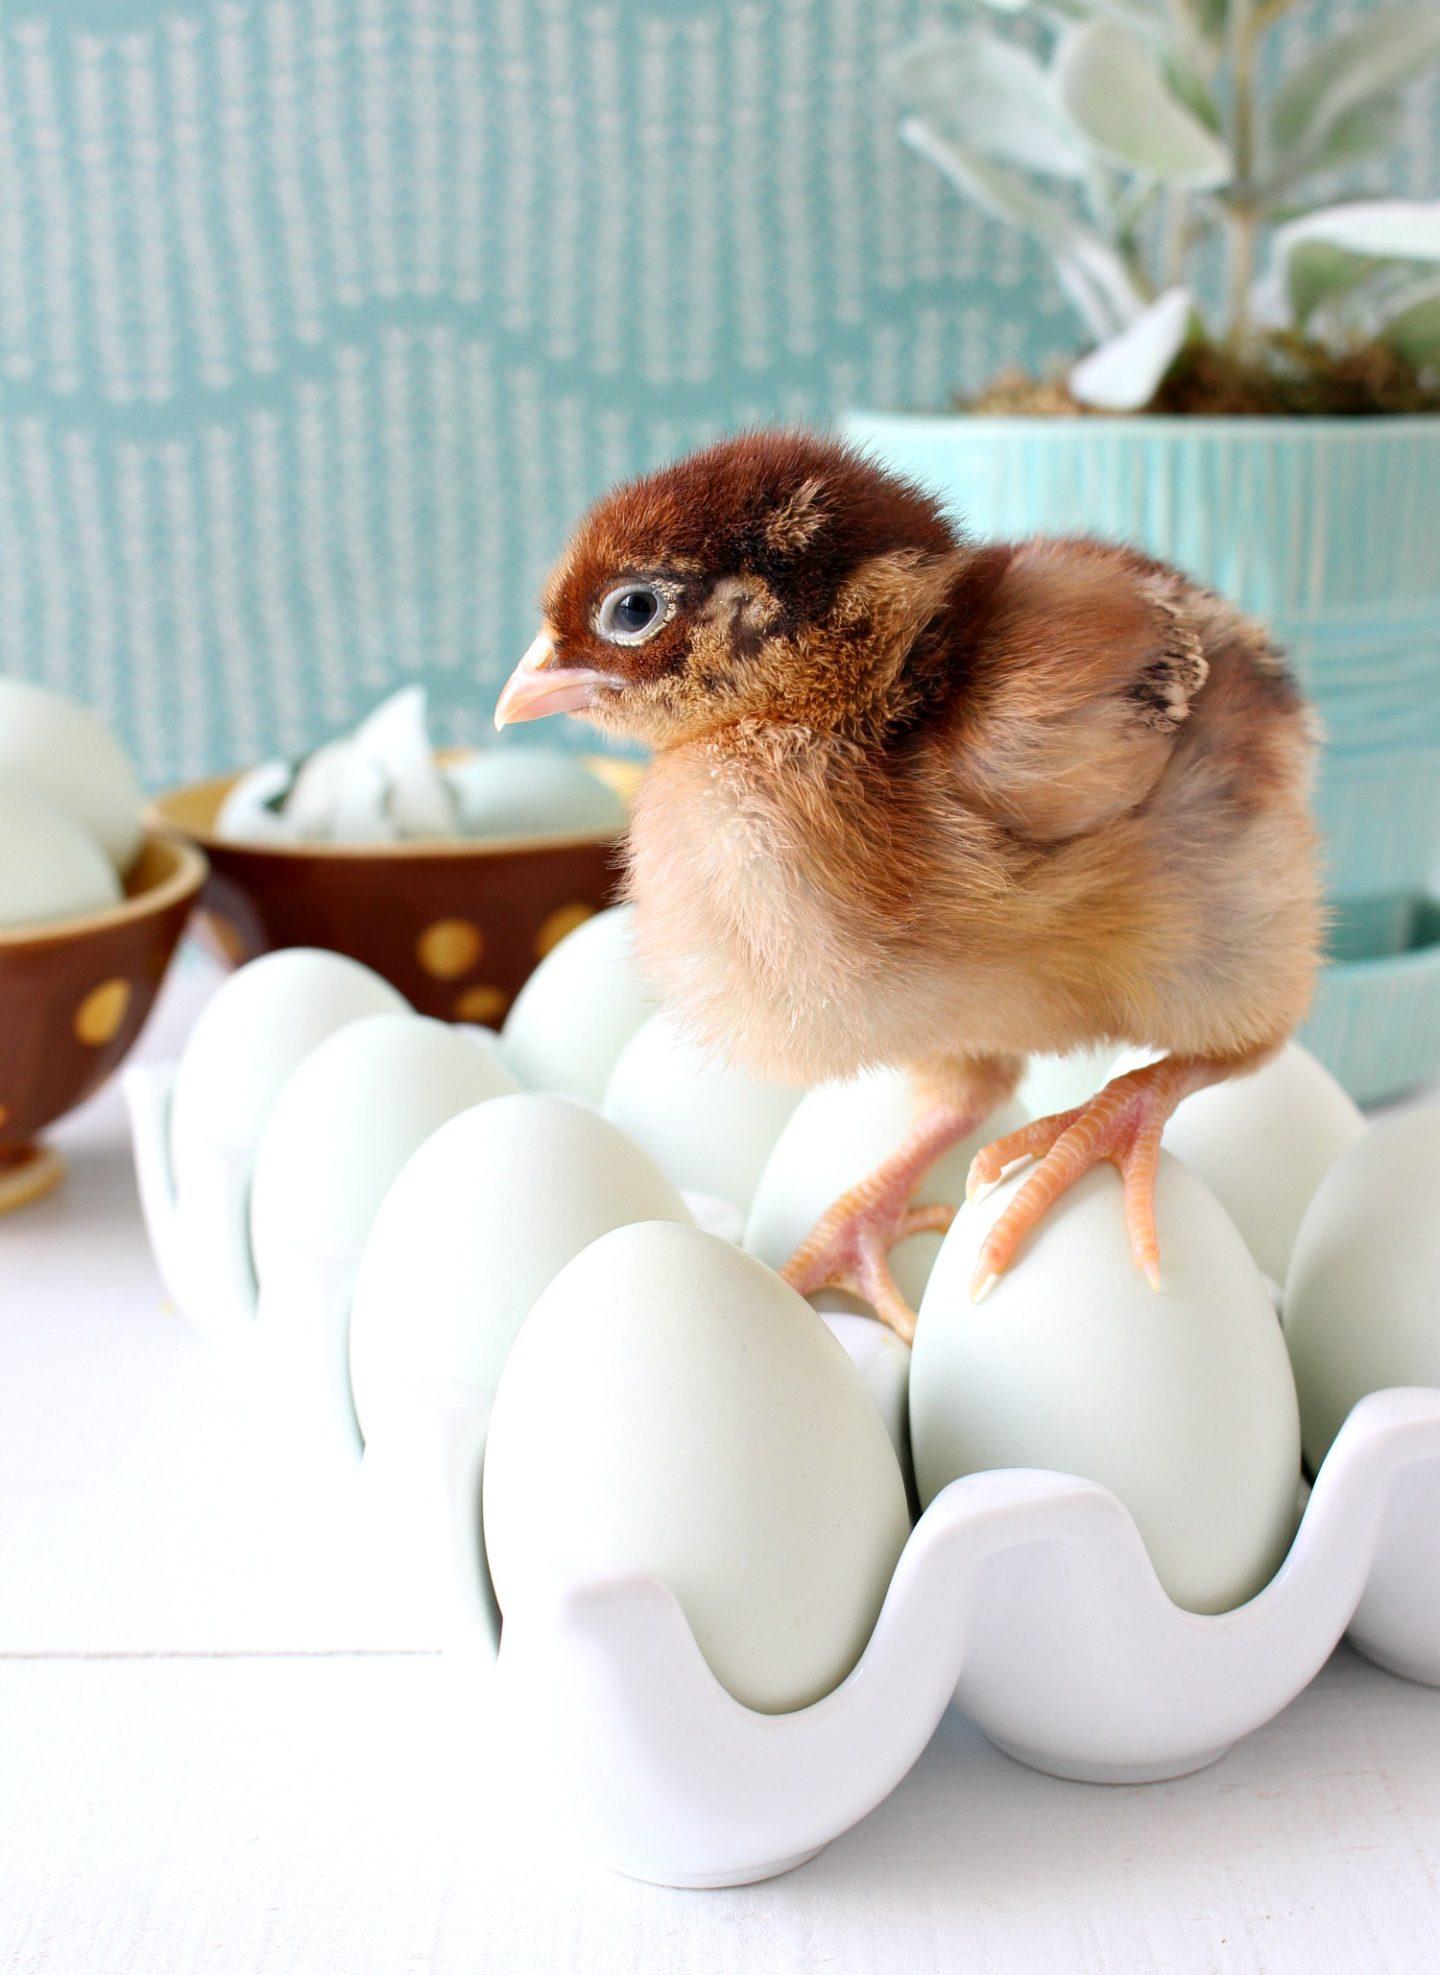 Fuzzy Baby Chicks